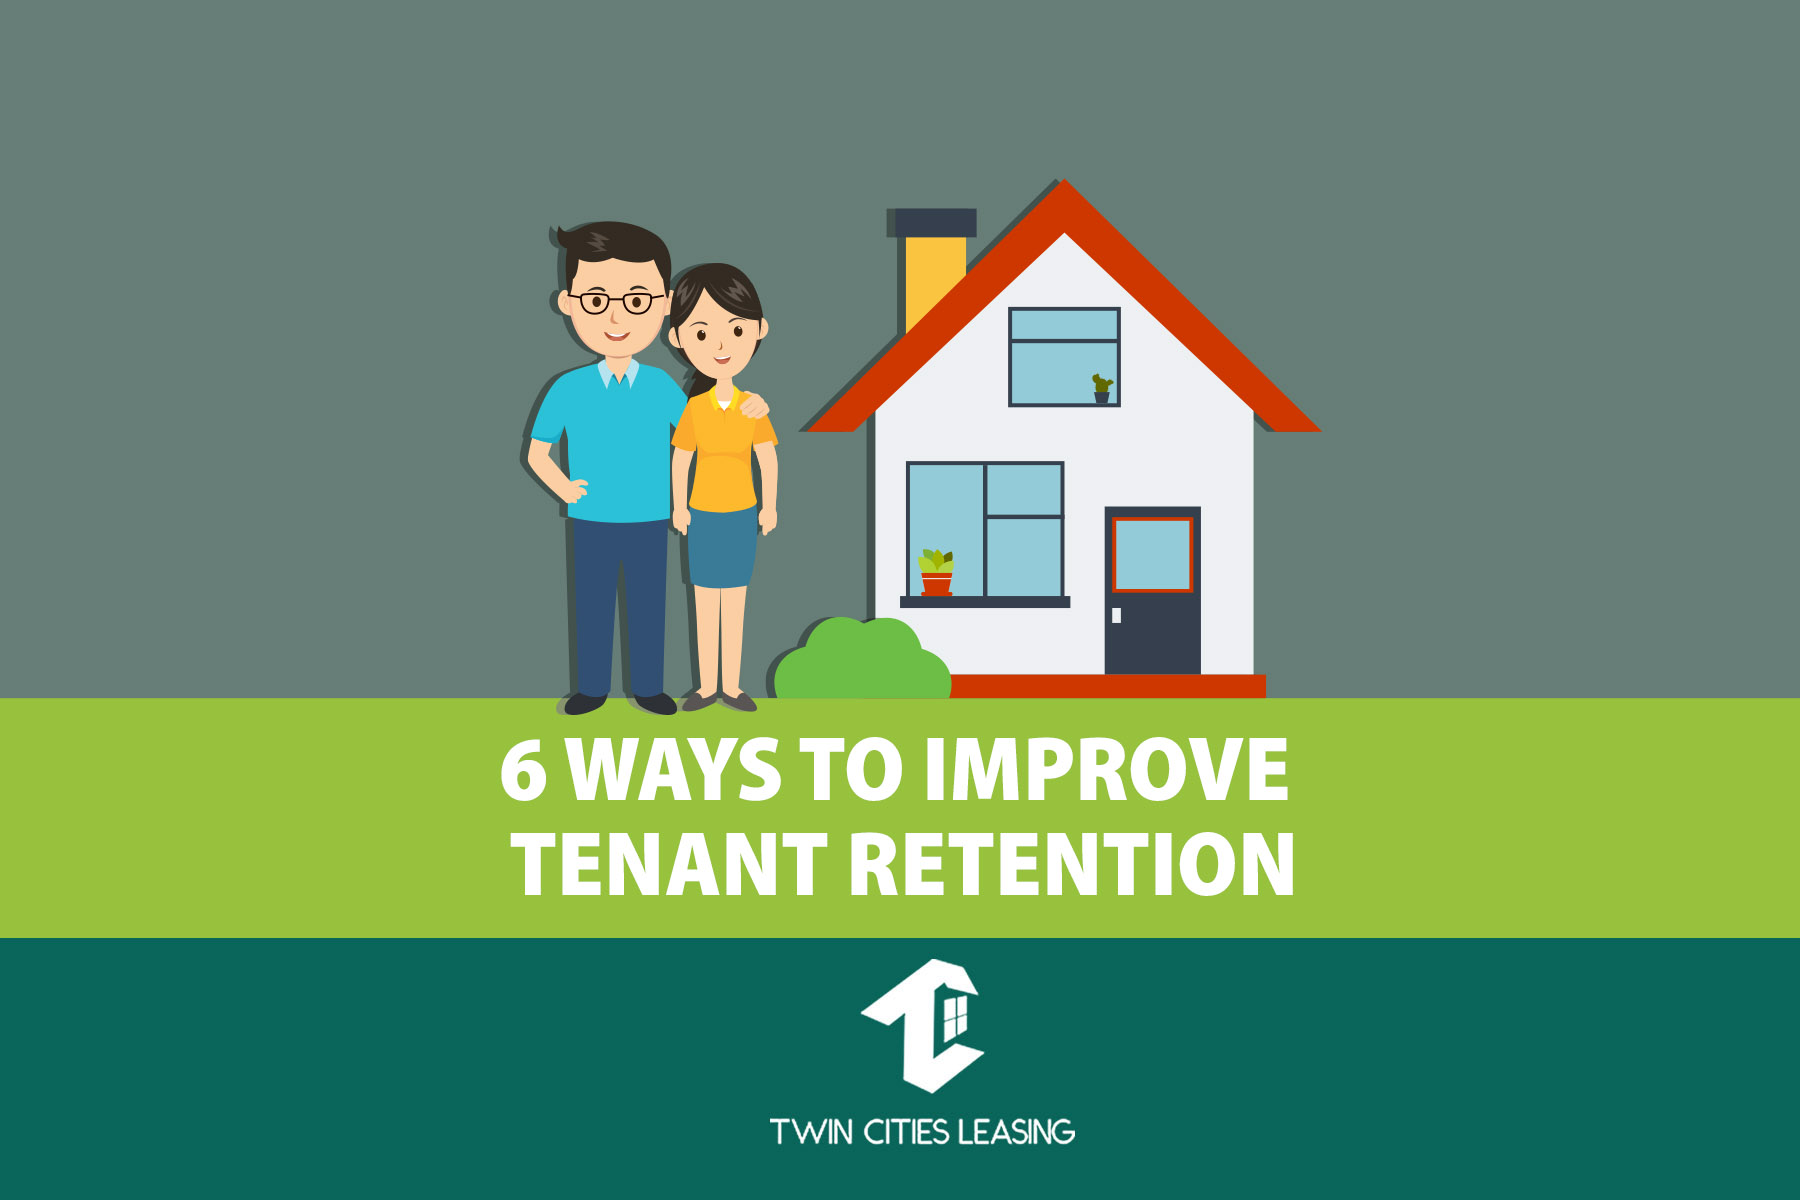 6 Ways to Improve Tenant Retention